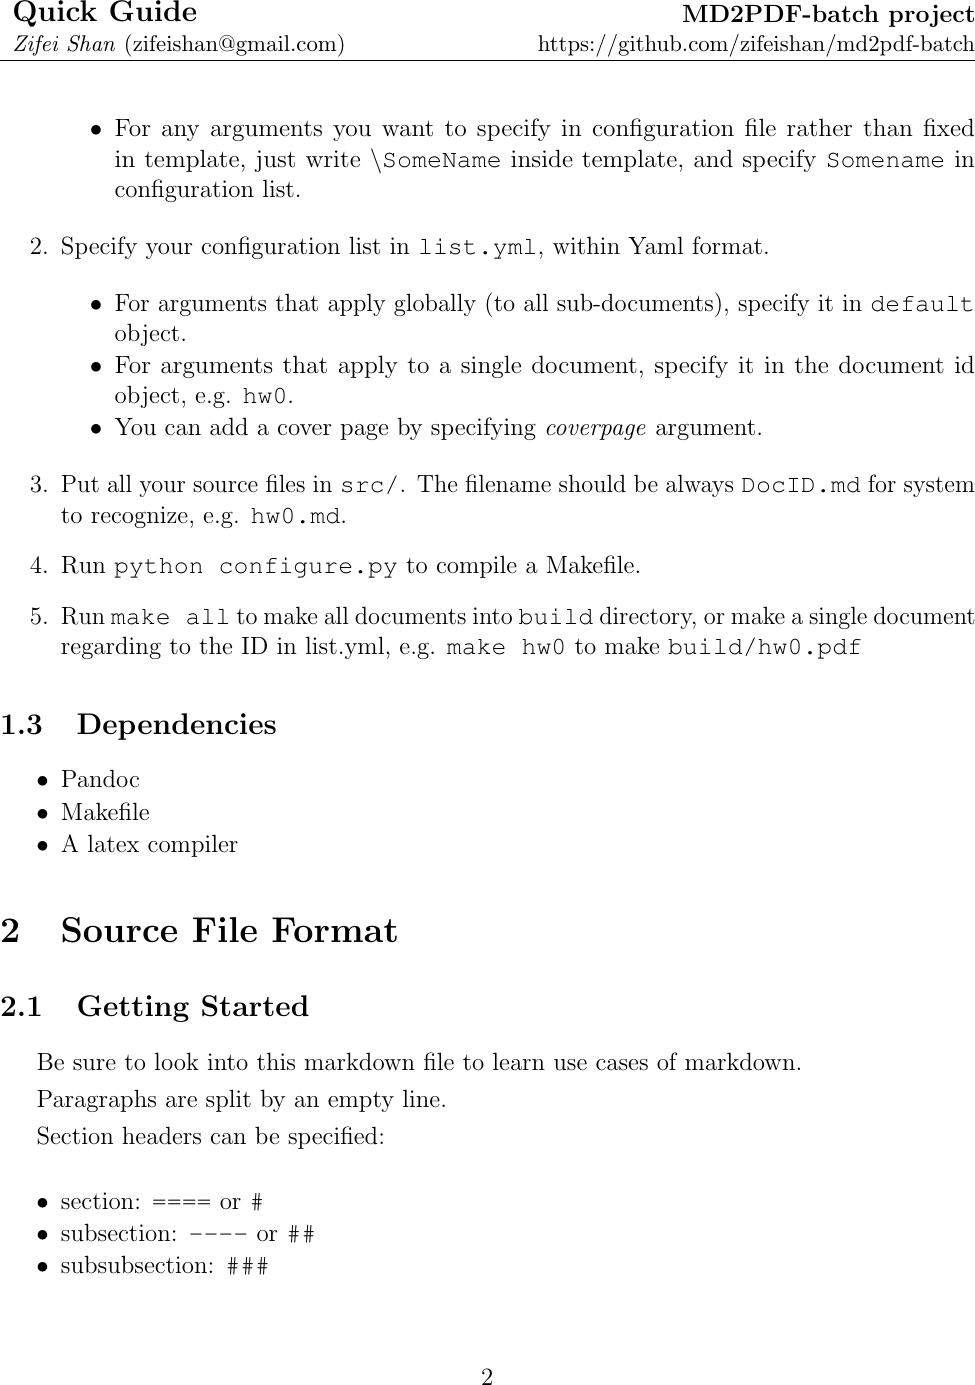 MD2PDF Guide